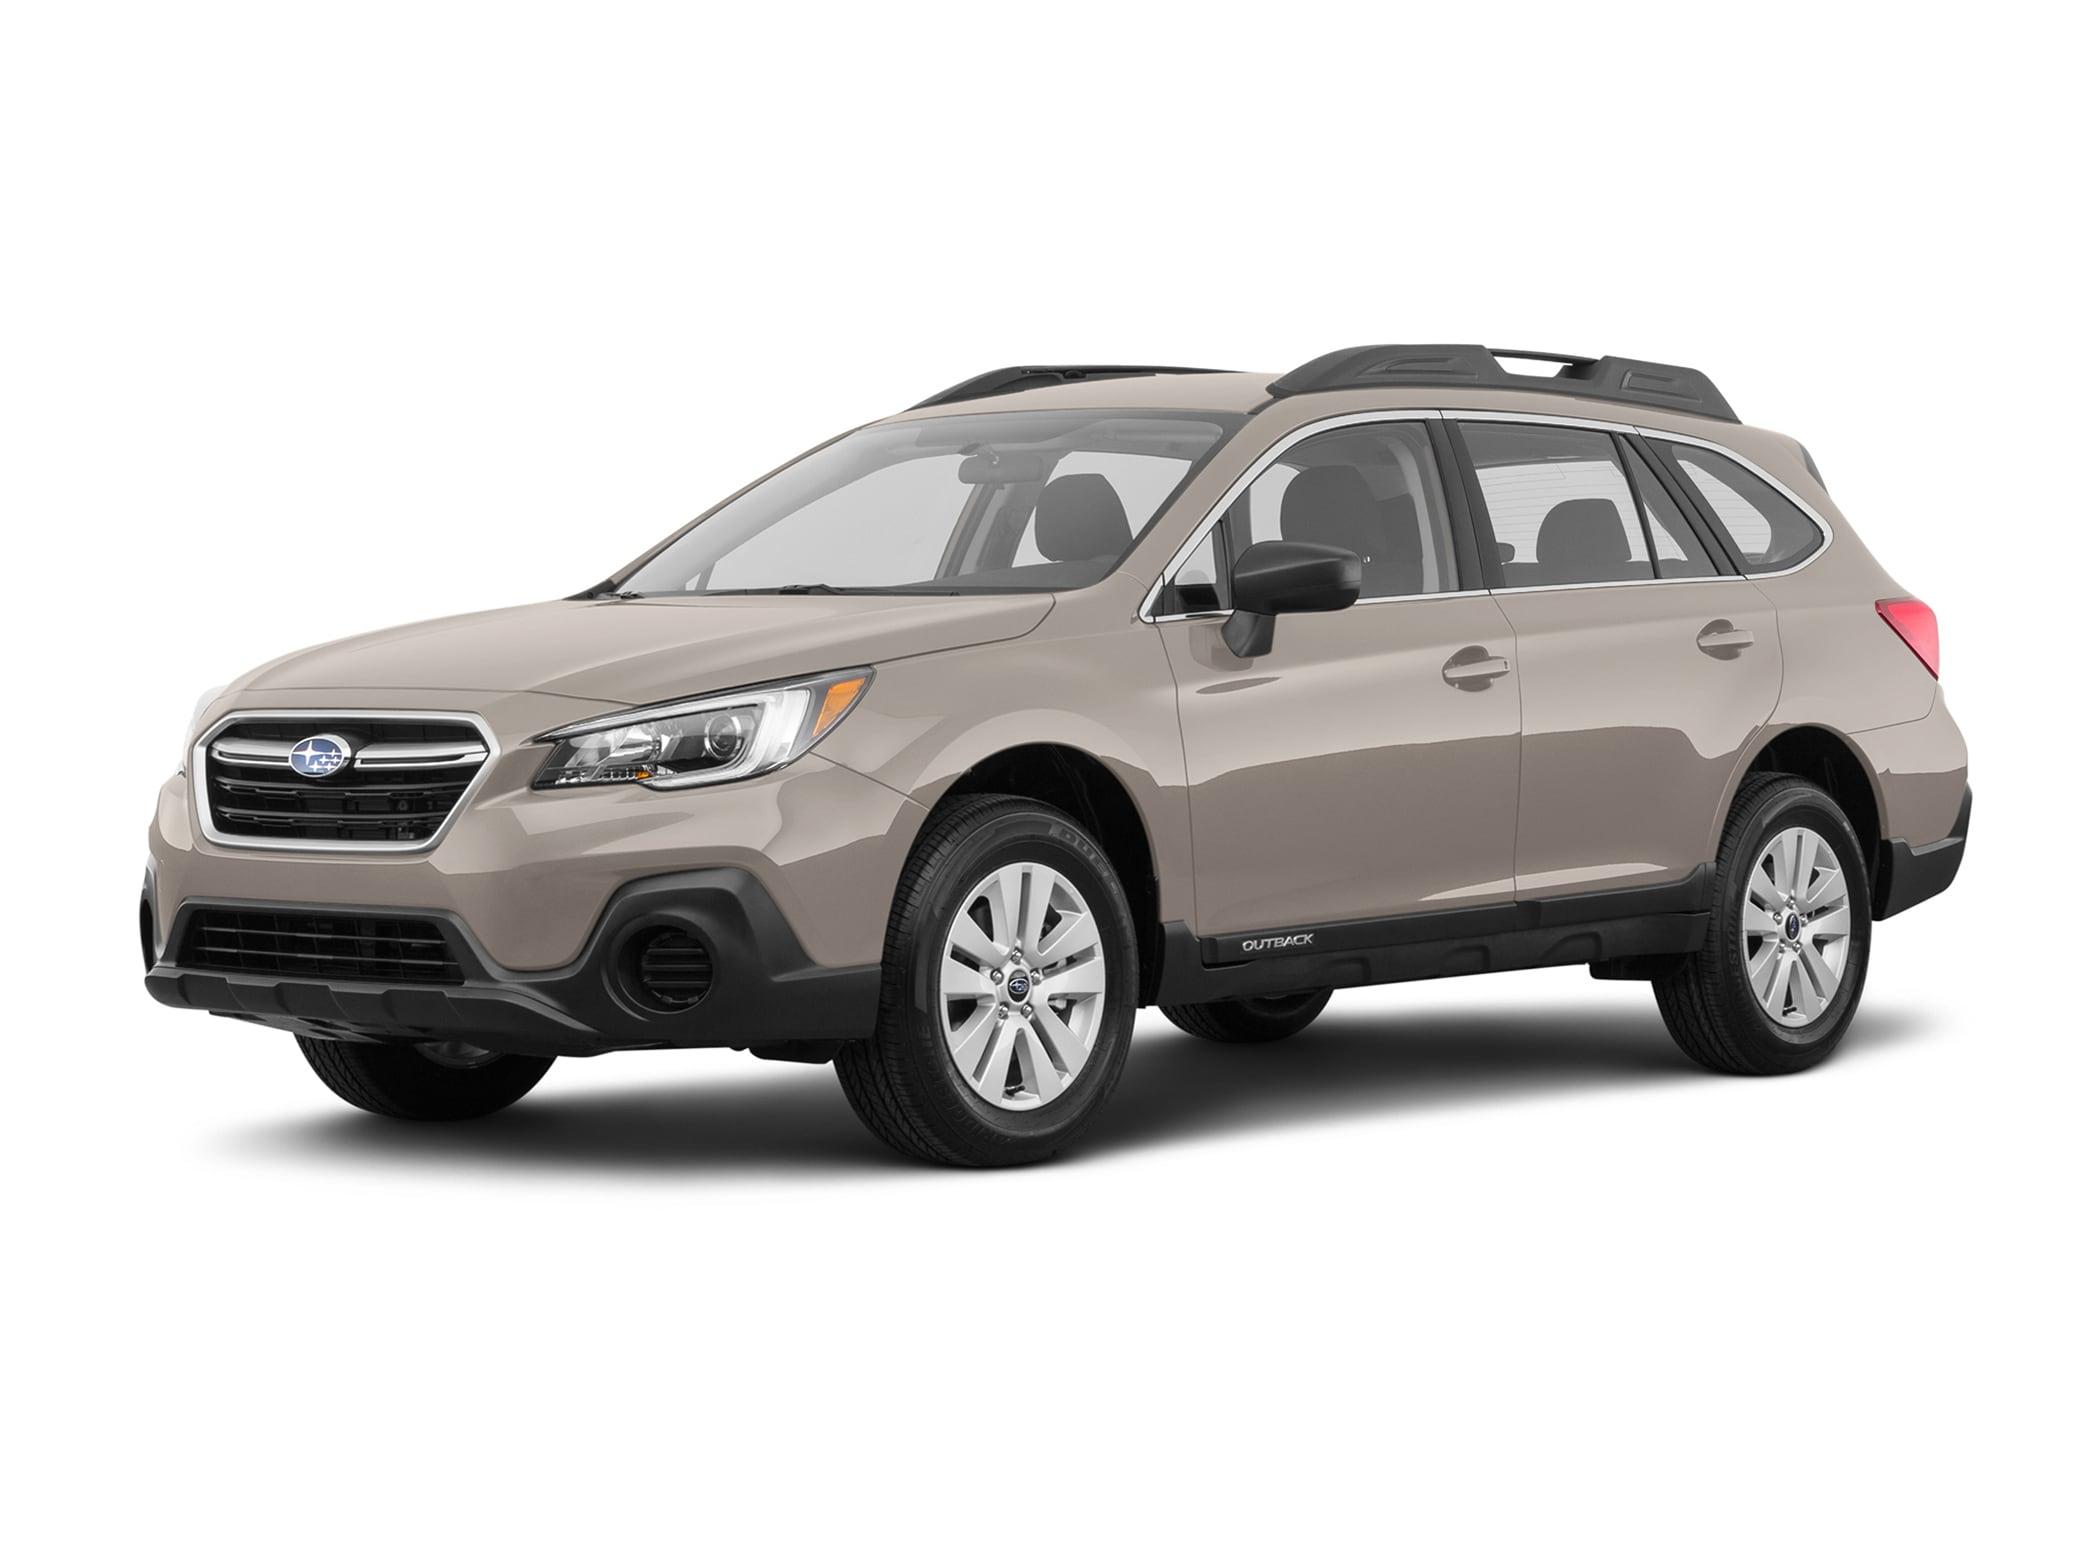 2019 Subaru Outback 2.5I Mpvh Base SUV